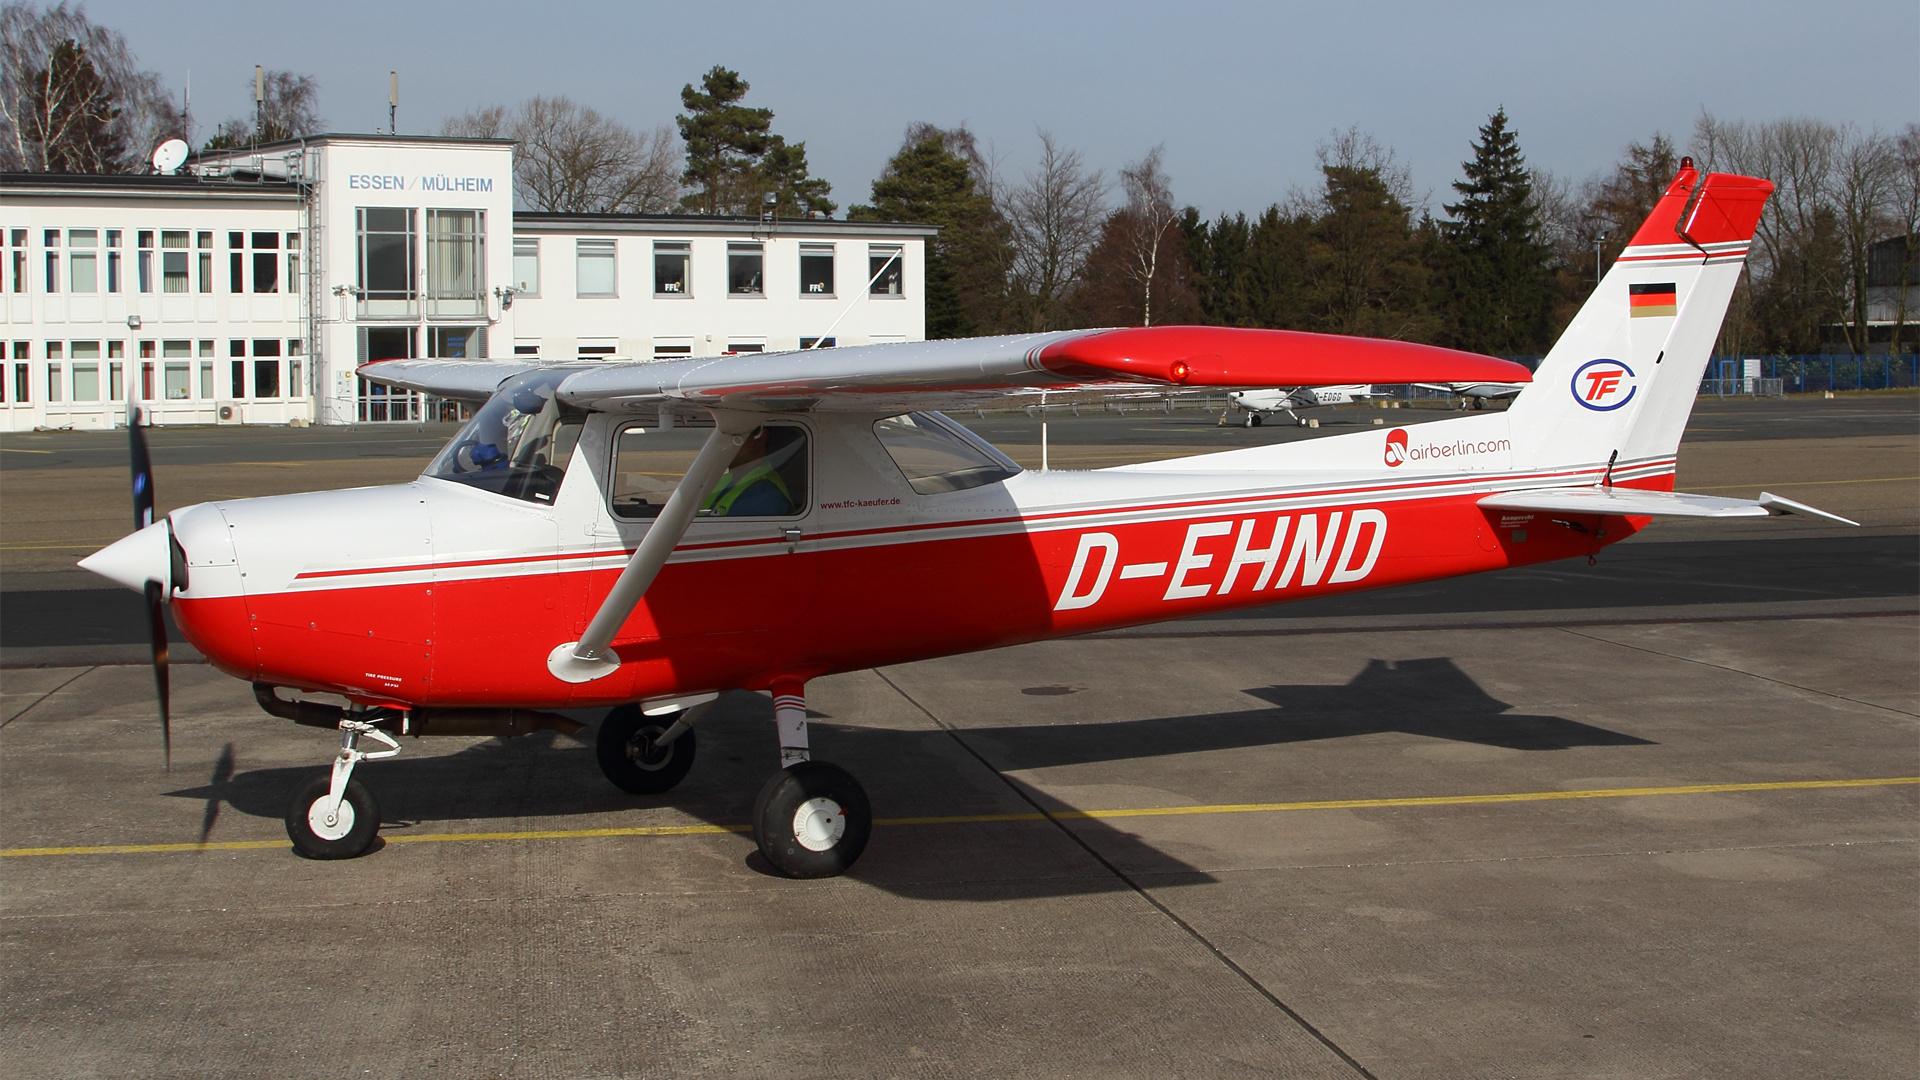 D-EHND-1 C150 ESS 201502